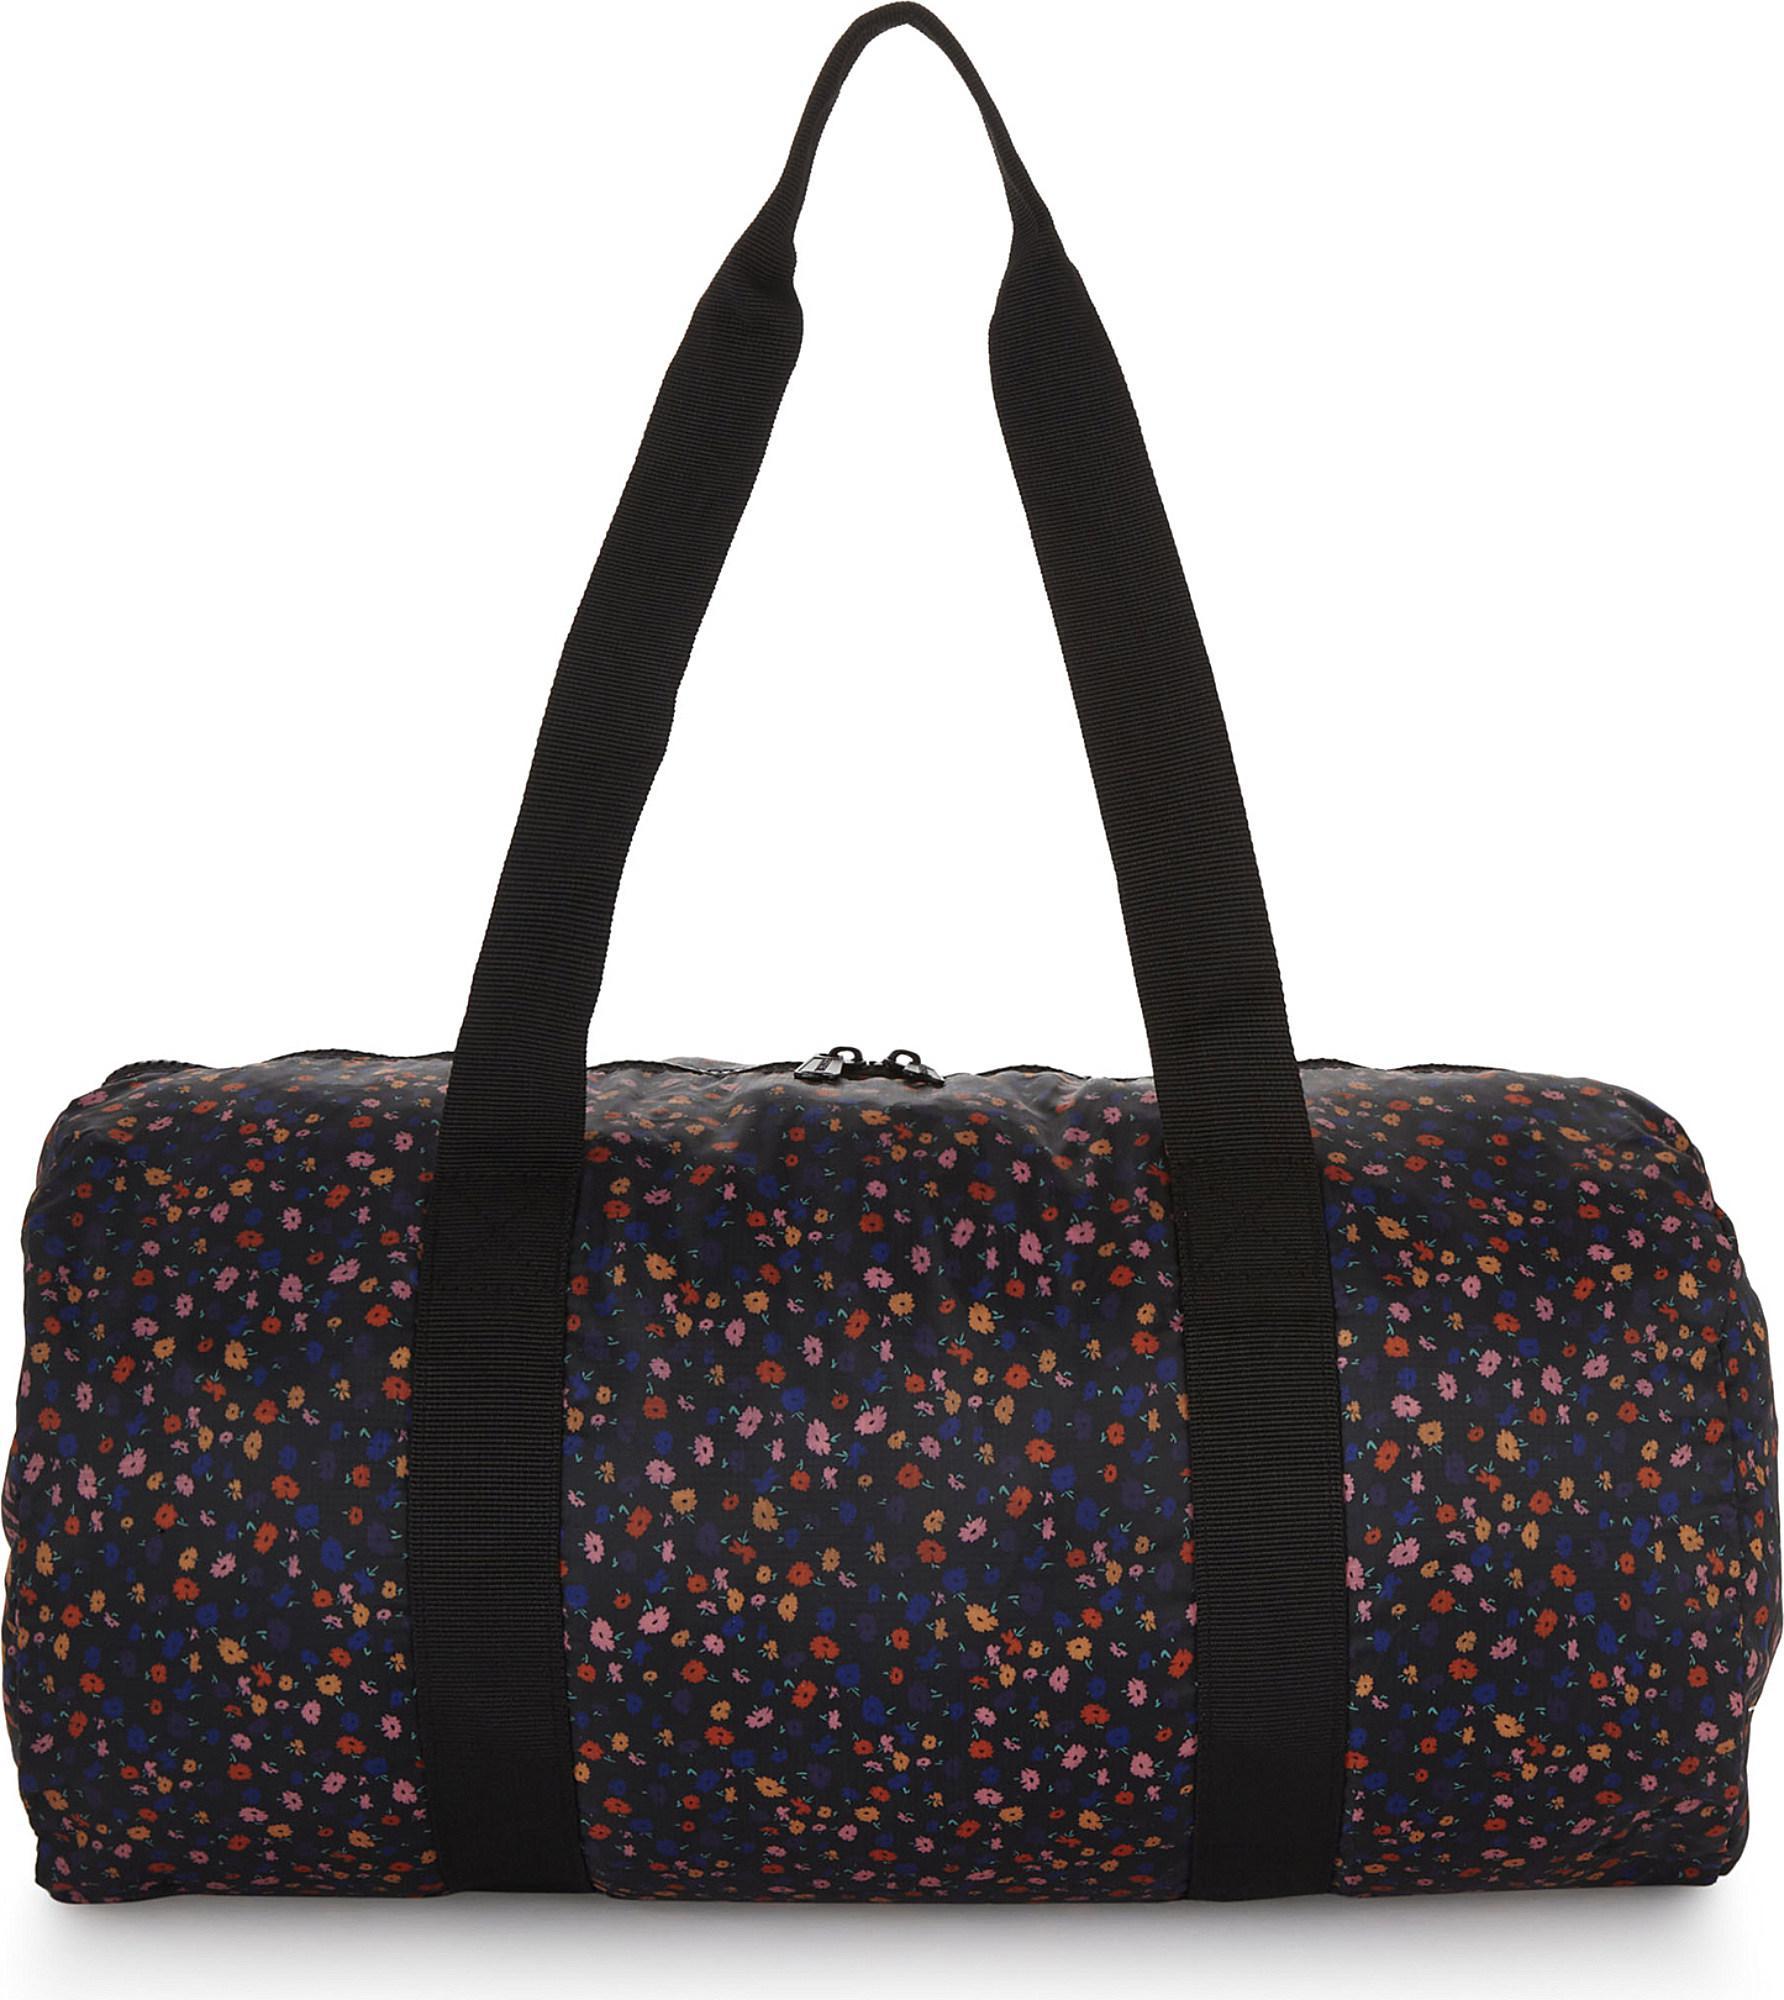 Lyst - Herschel Supply Co. Packable Floral-print Duffel Bag In Black - Save 5%